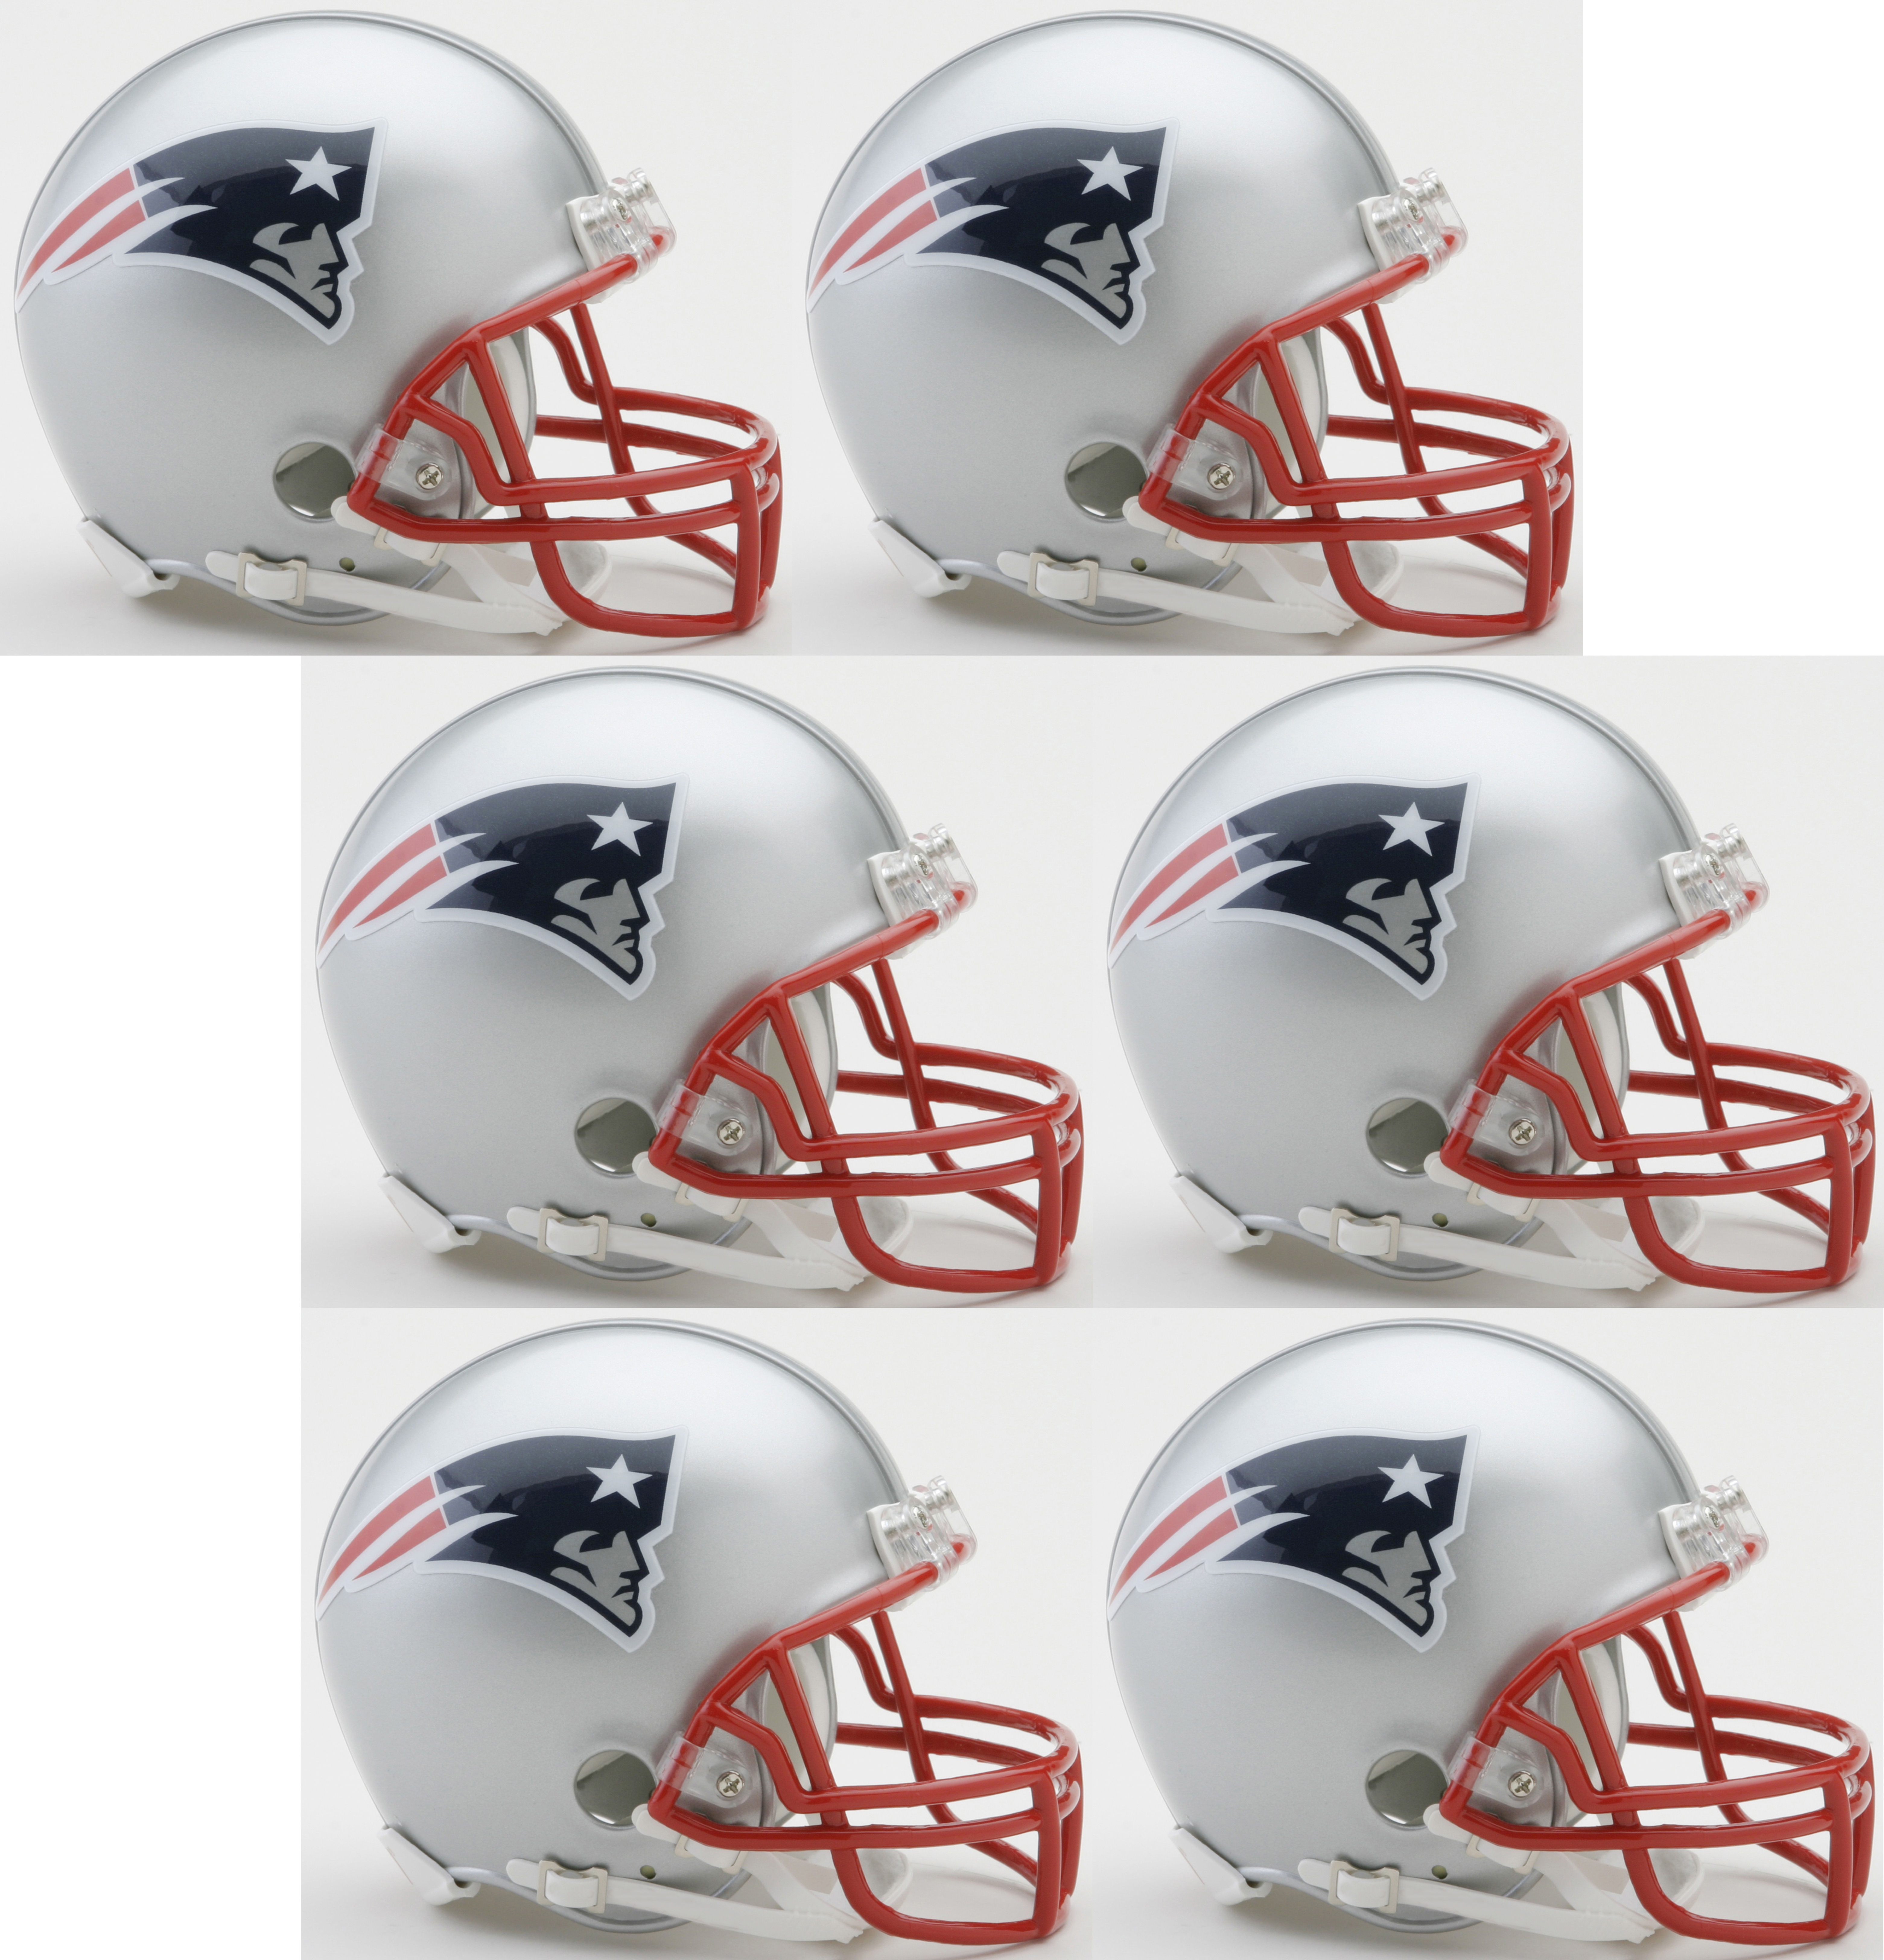 New England Patriots NFL Mini Football Helmet 6 count